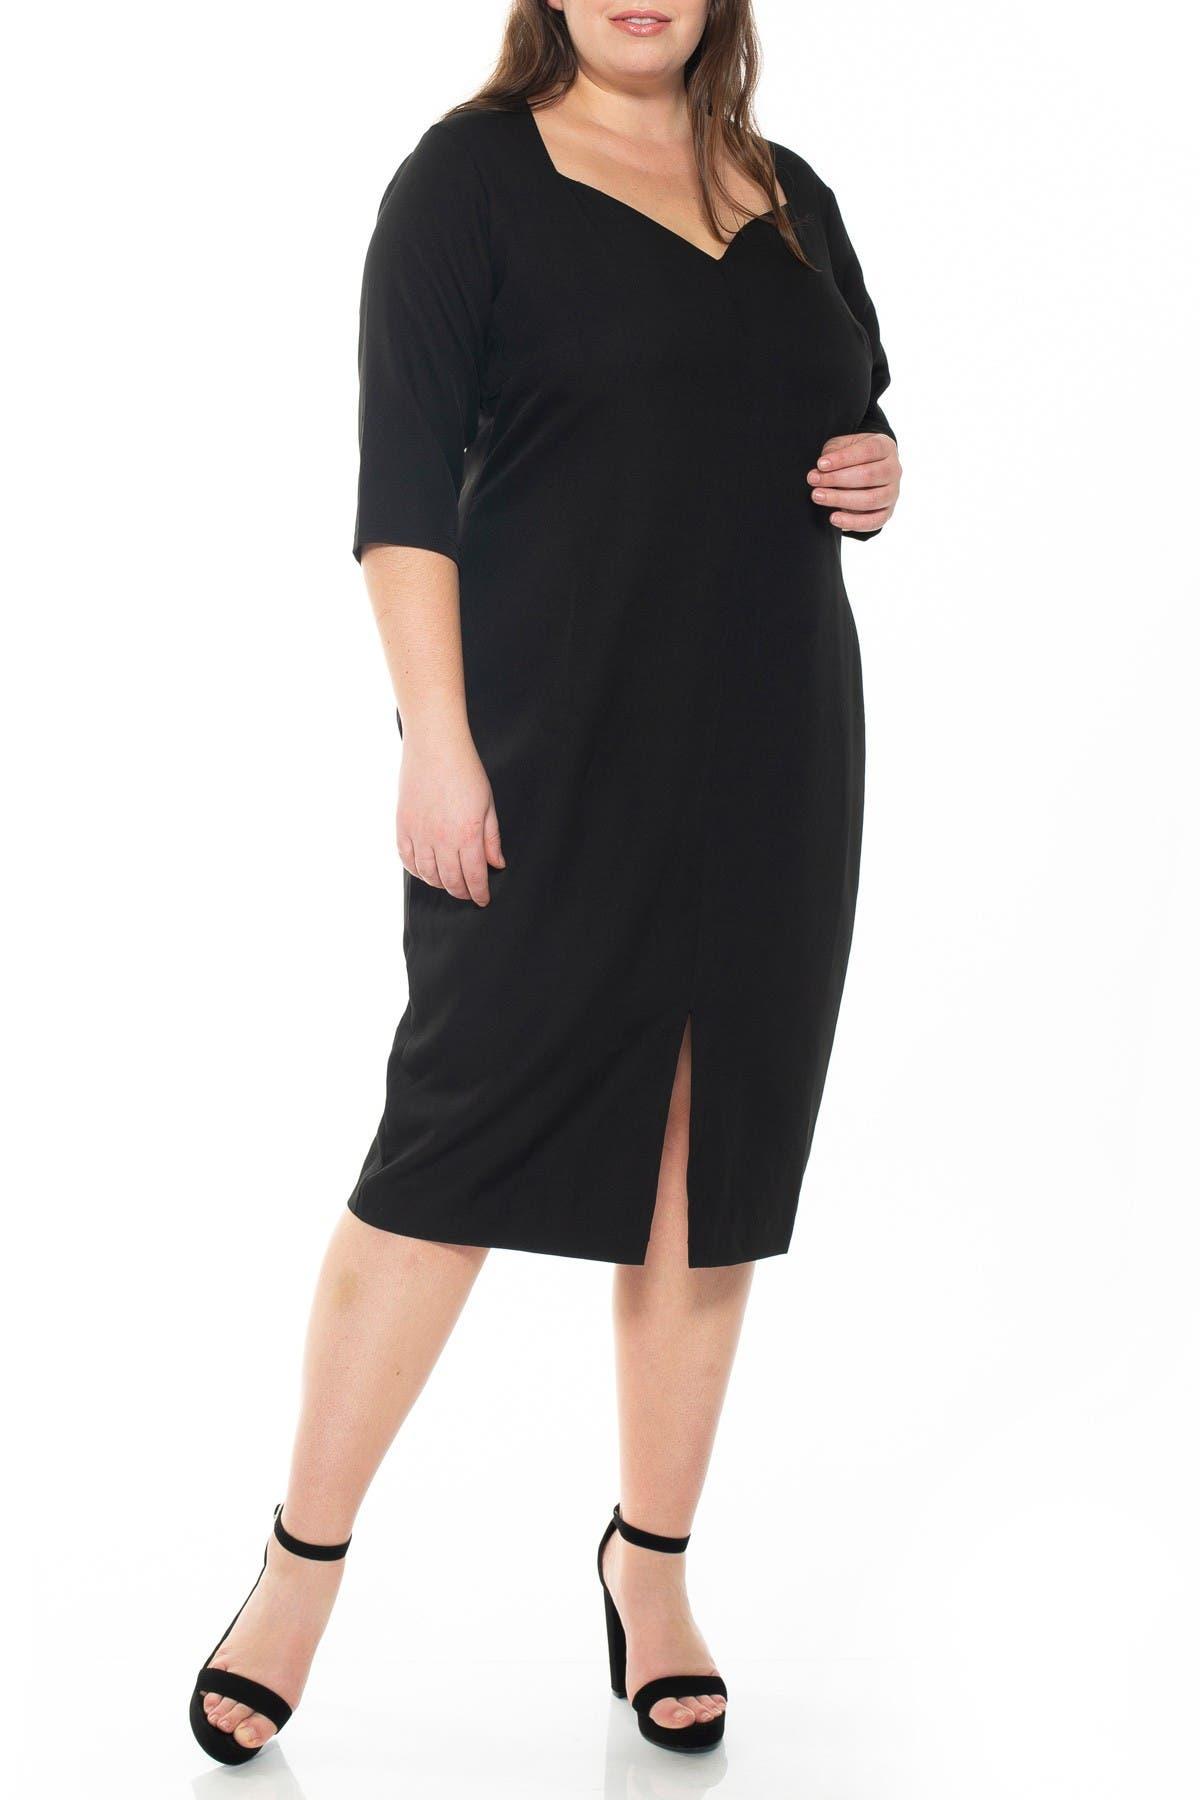 Image of Alexia Admor Michelle Sweetheart 3/4 Sleeve Sheath Dress